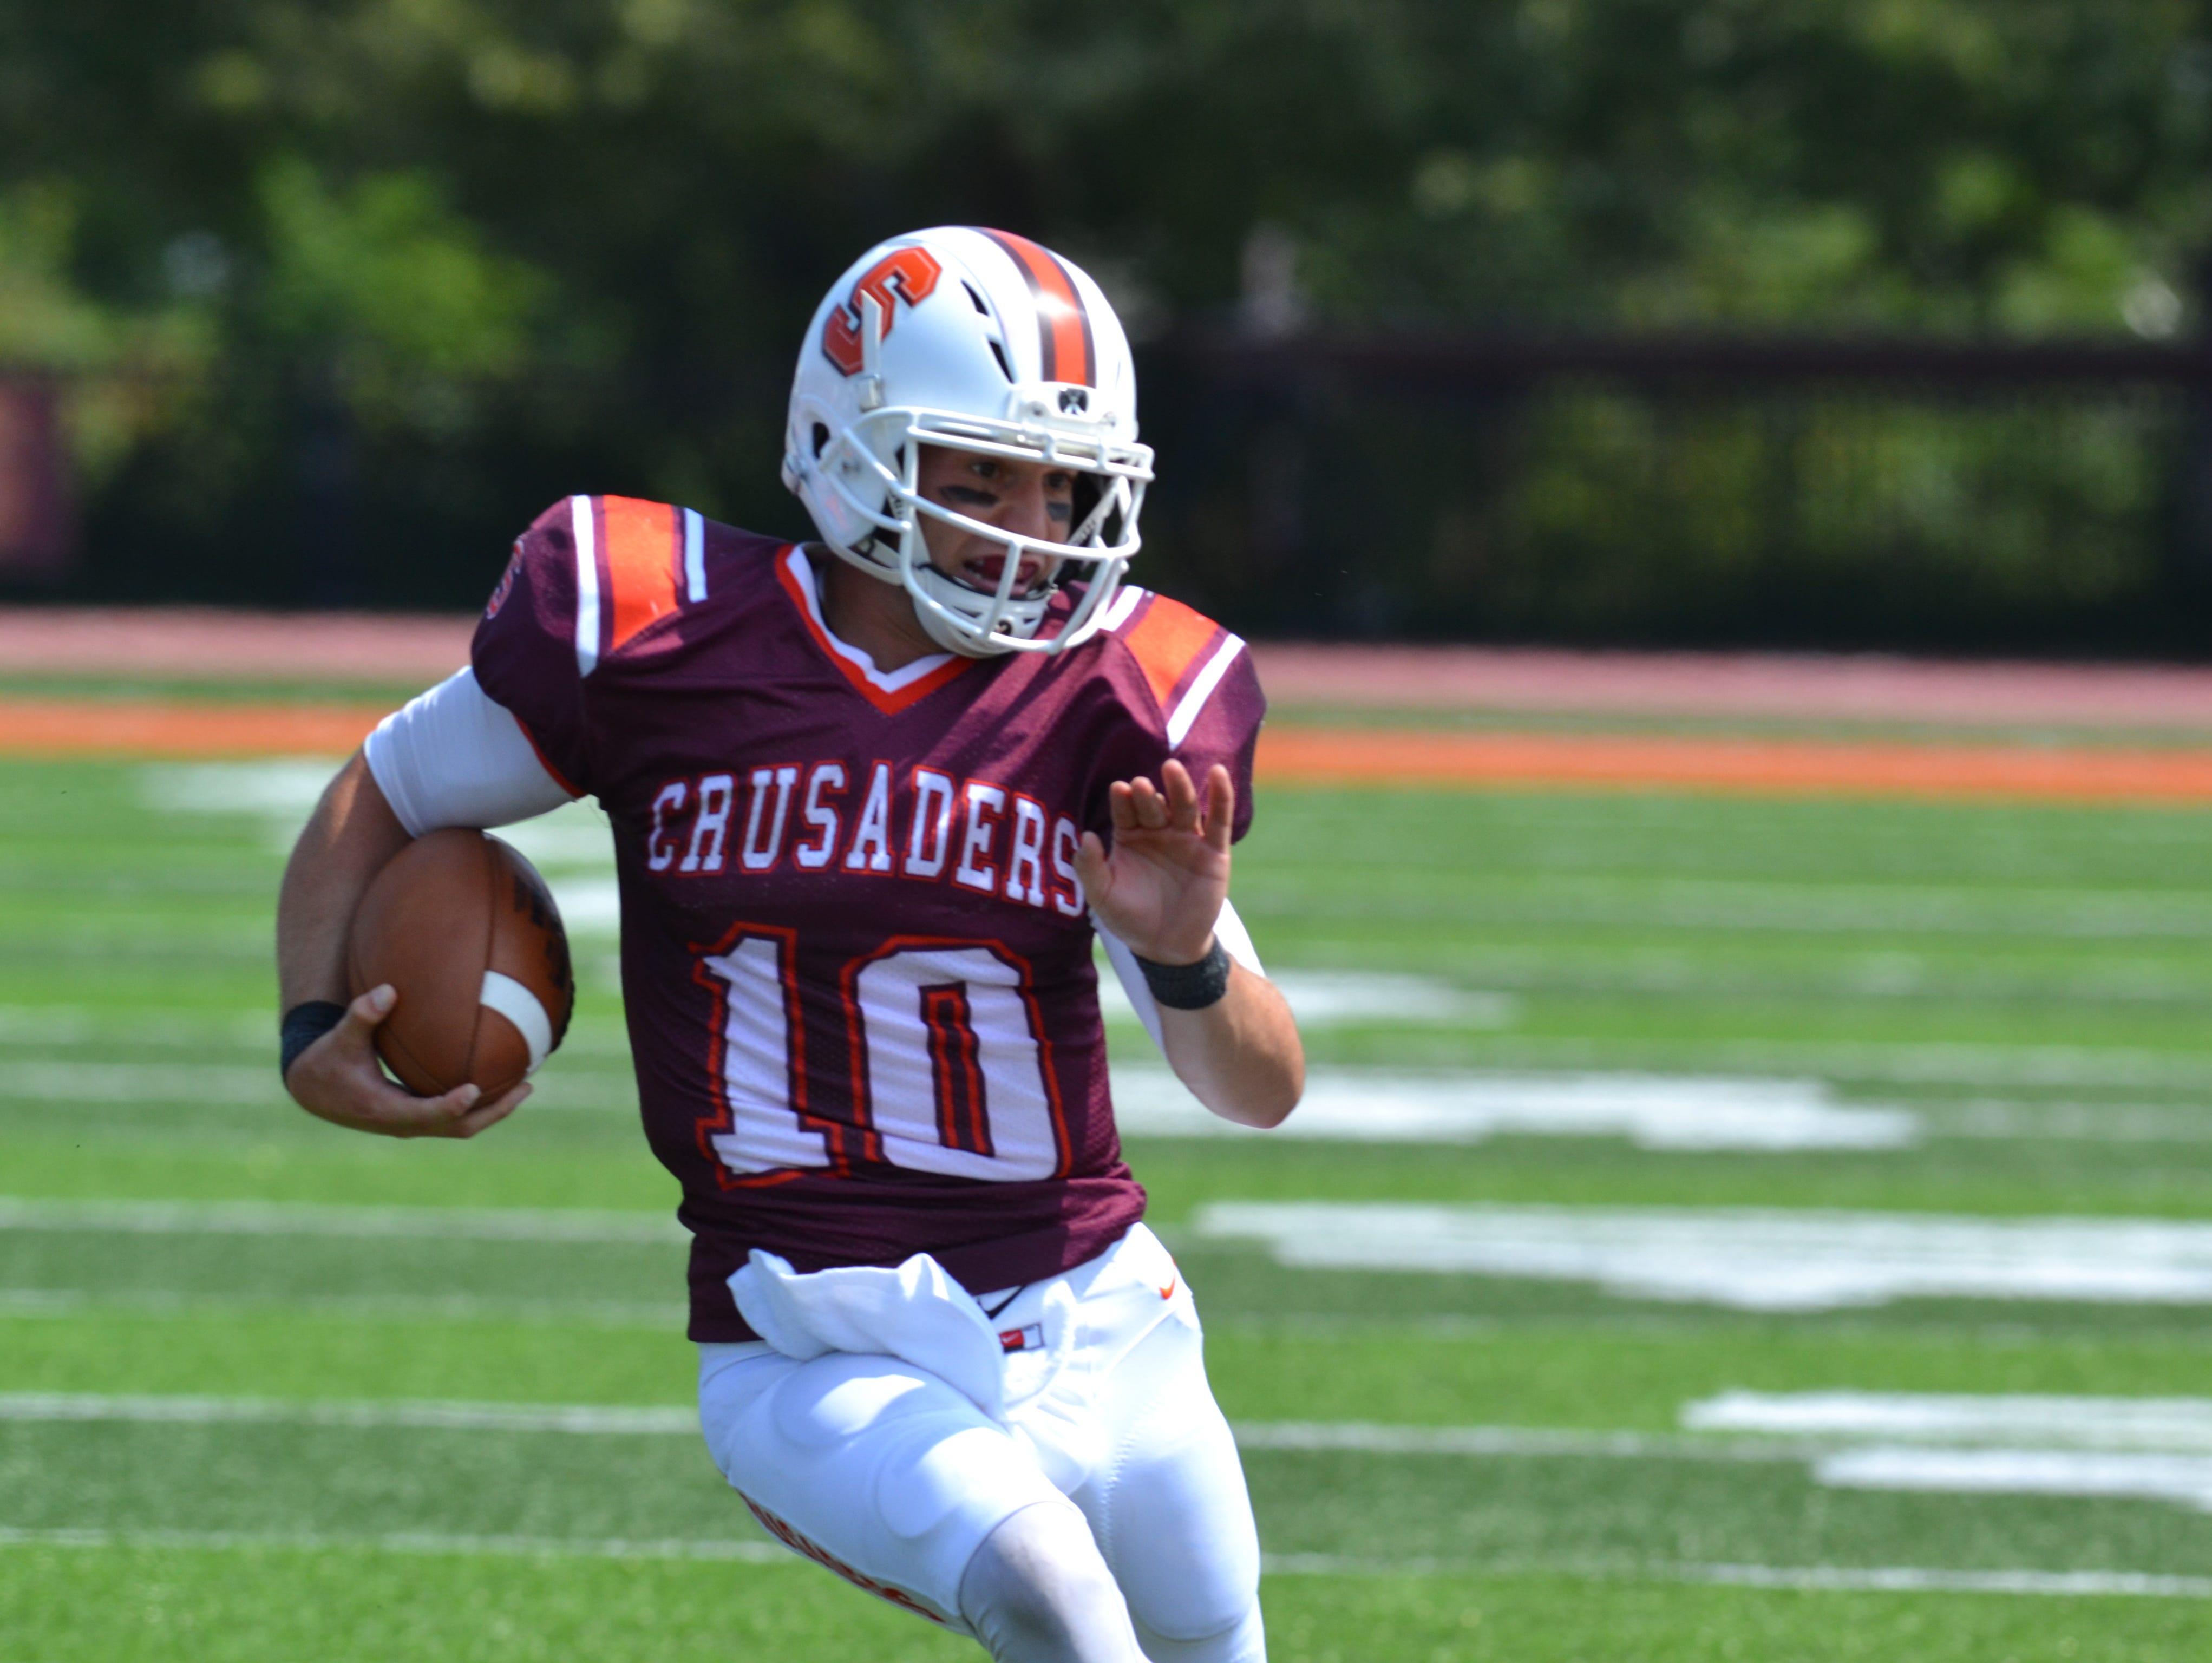 Susquehanna quarterback Nick Crusco of Oak Ridge